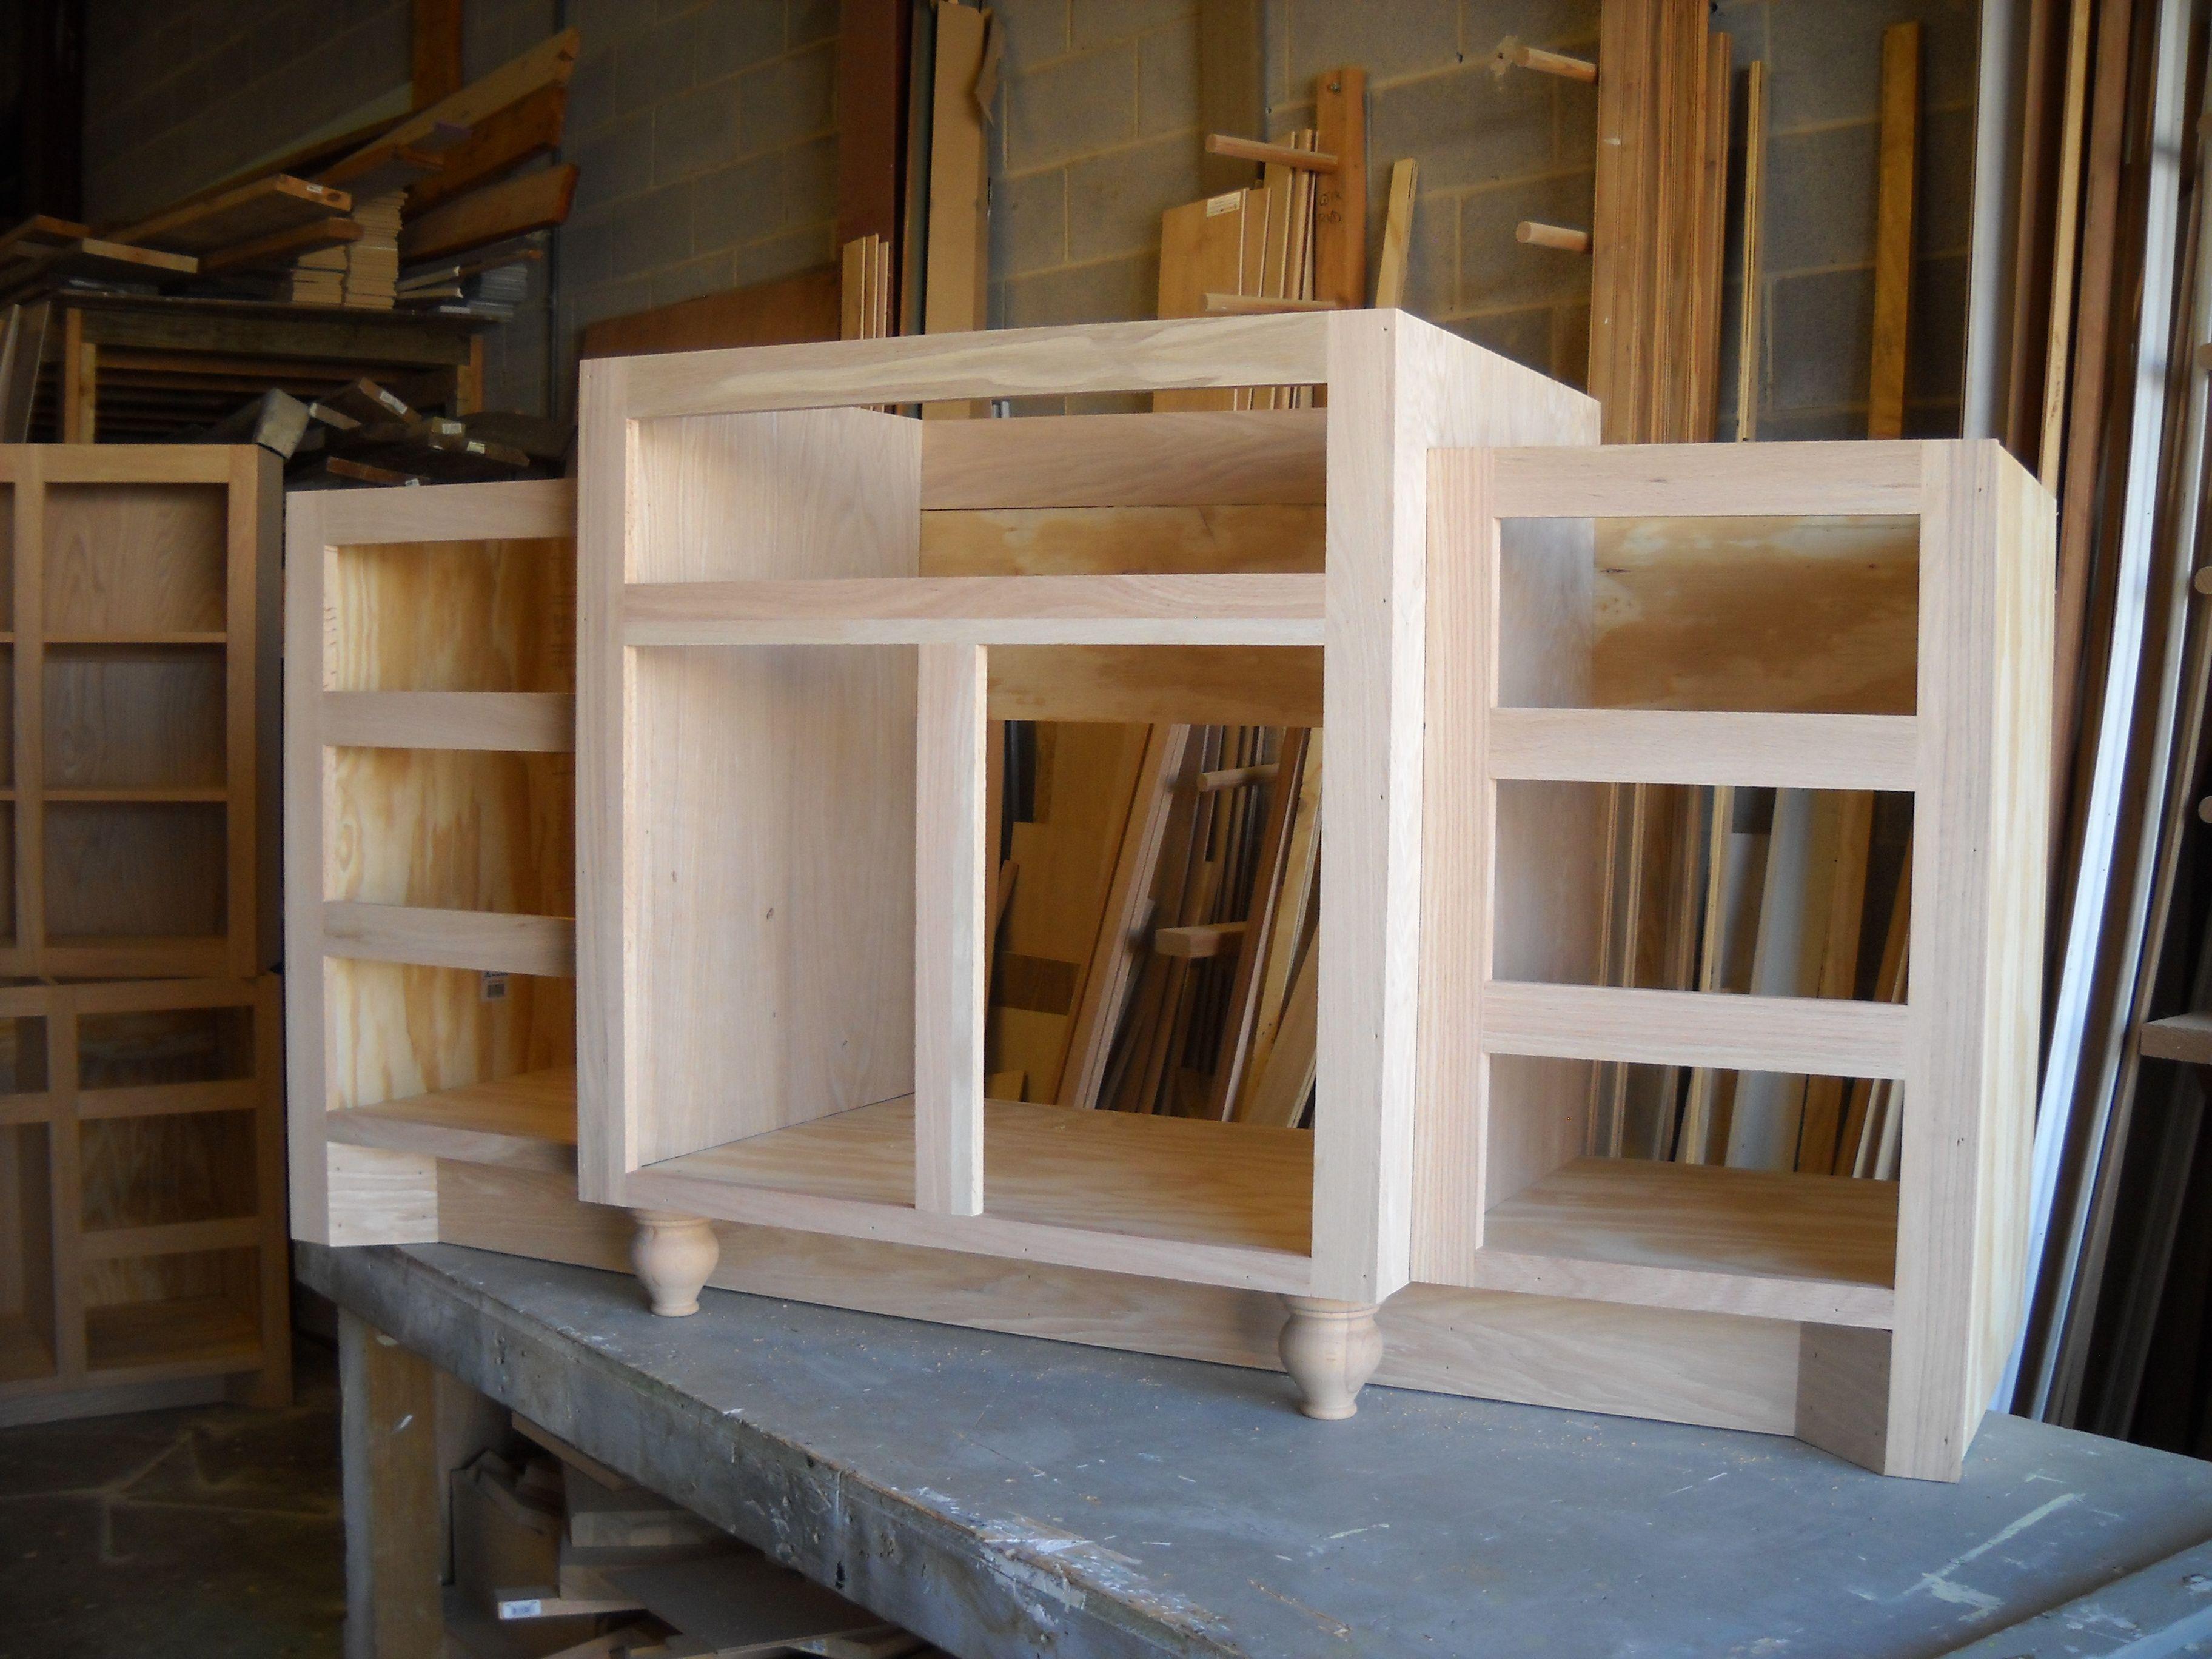 Bathroom vanity cabinet plans cabinet ideas - Building a bathroom vanity from scratch ...